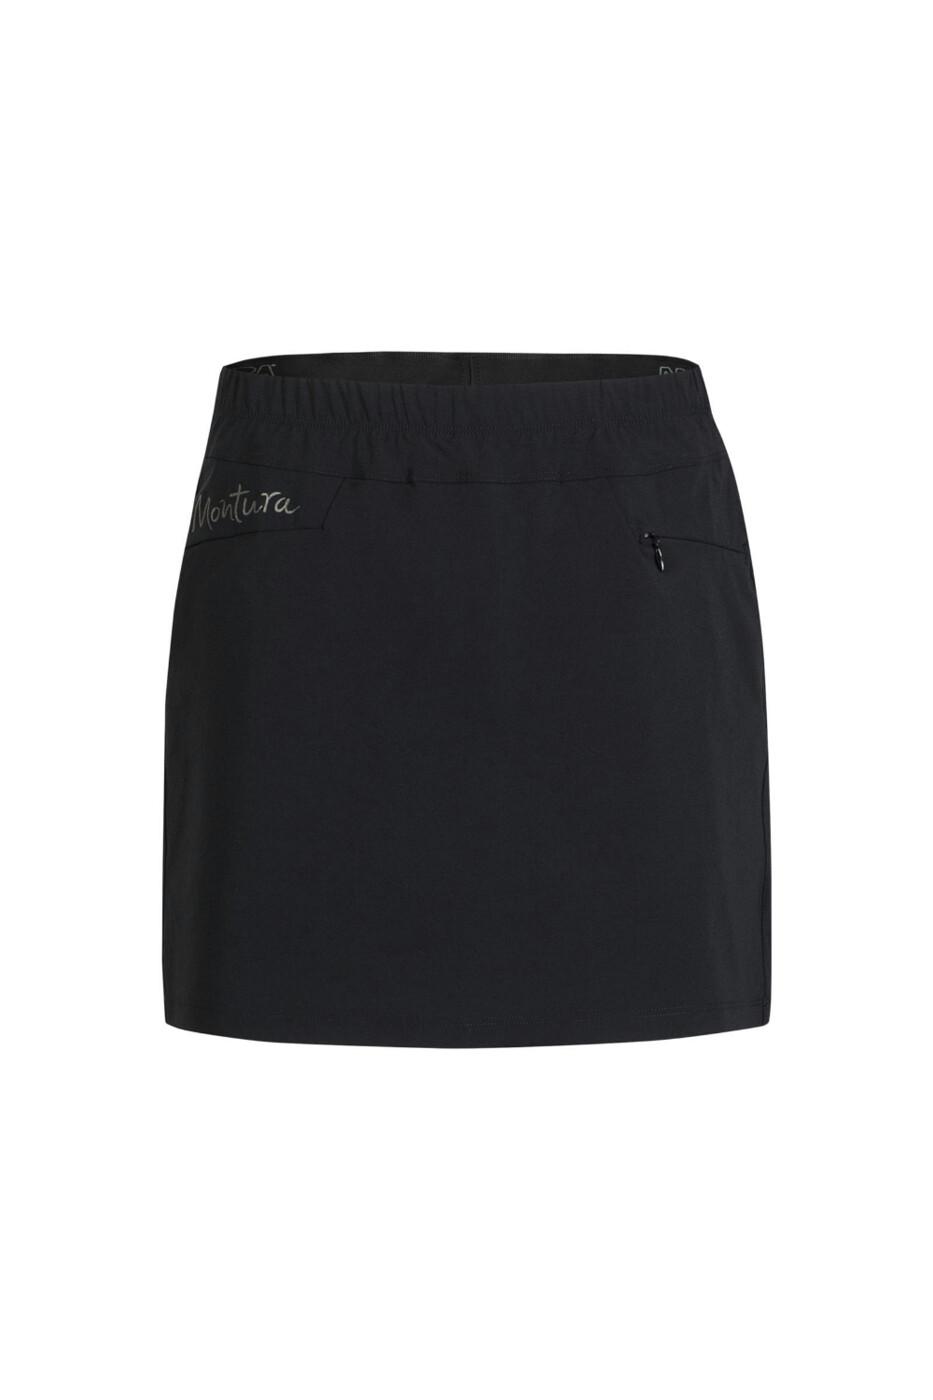 MONTURA Stretch Sporty Skirt - Damen